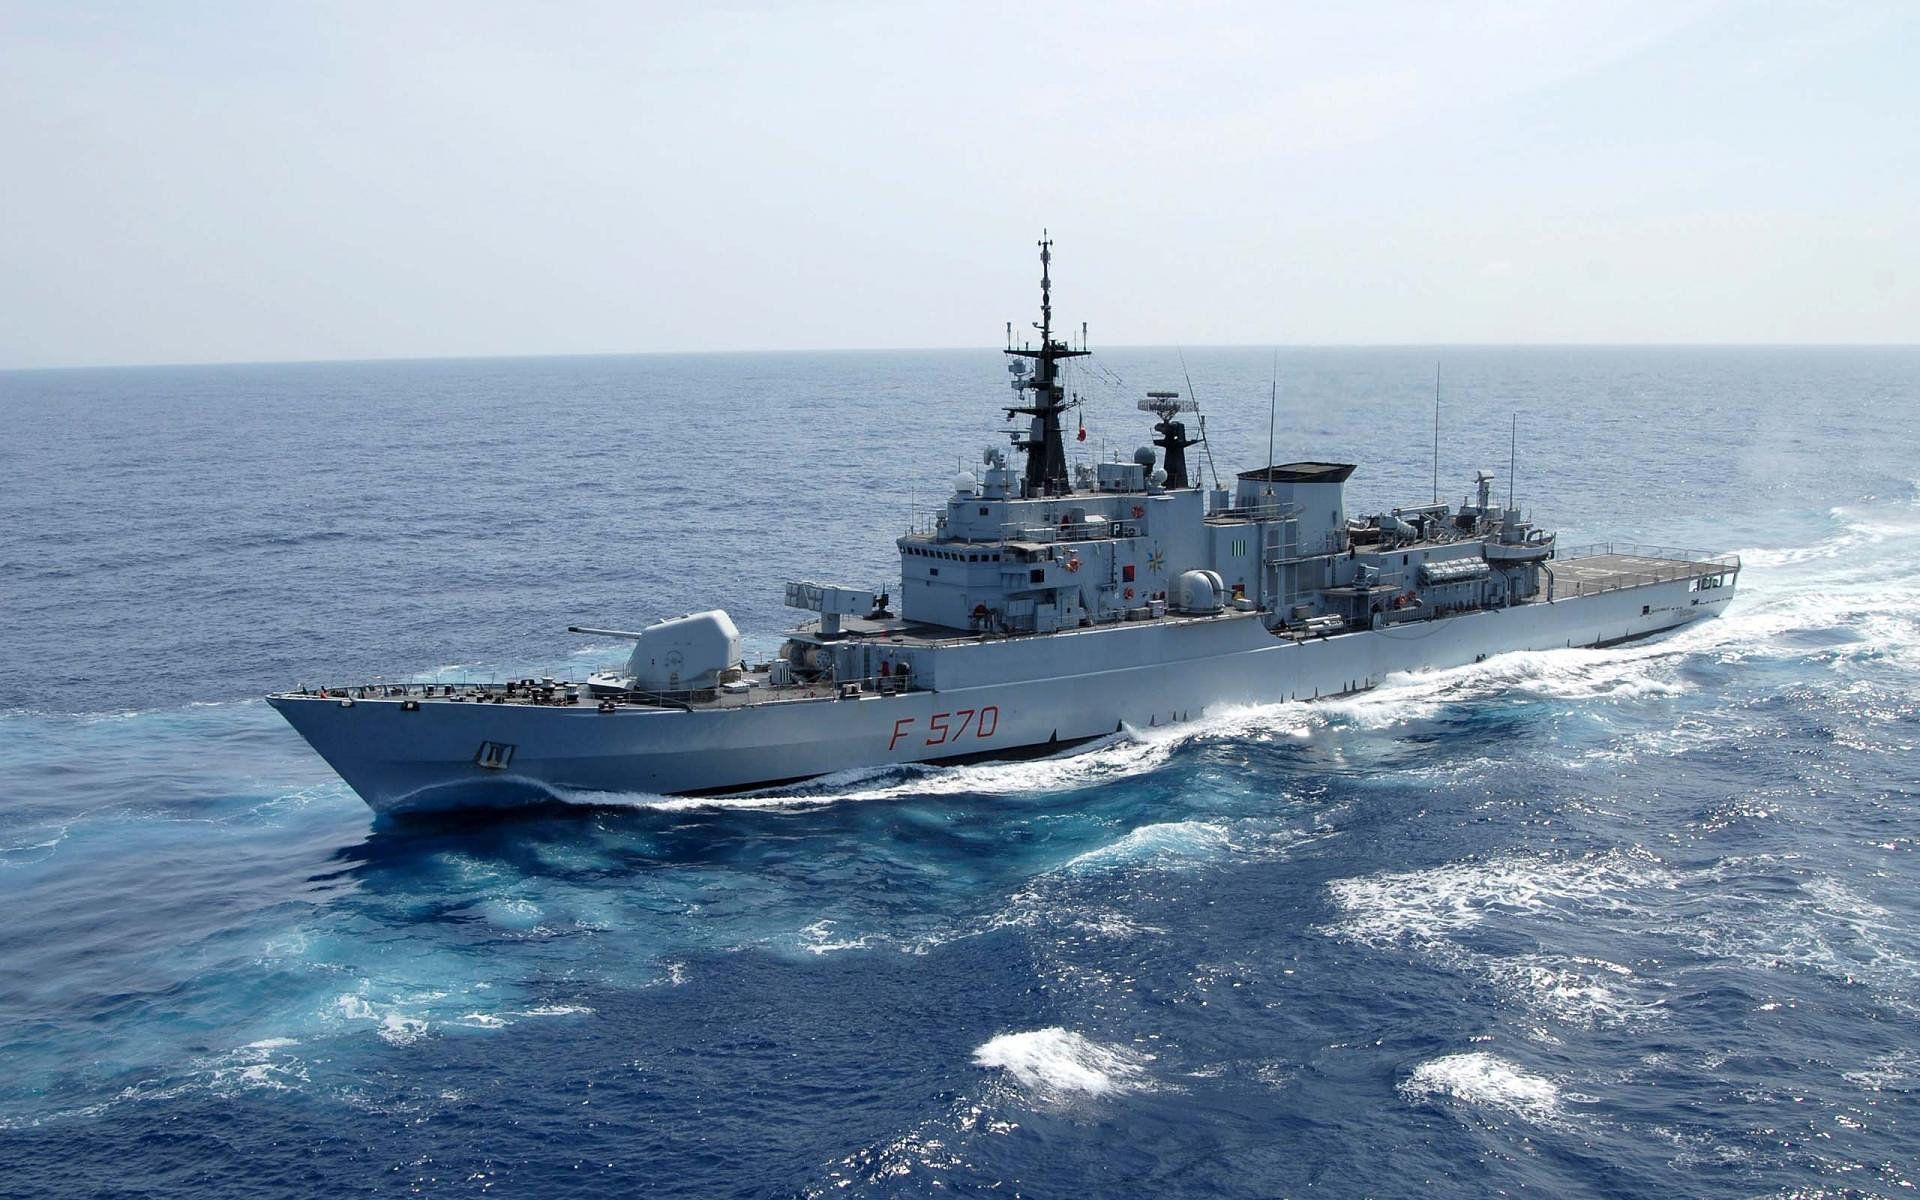 navy wallpaper 1440x900 ships - photo #5